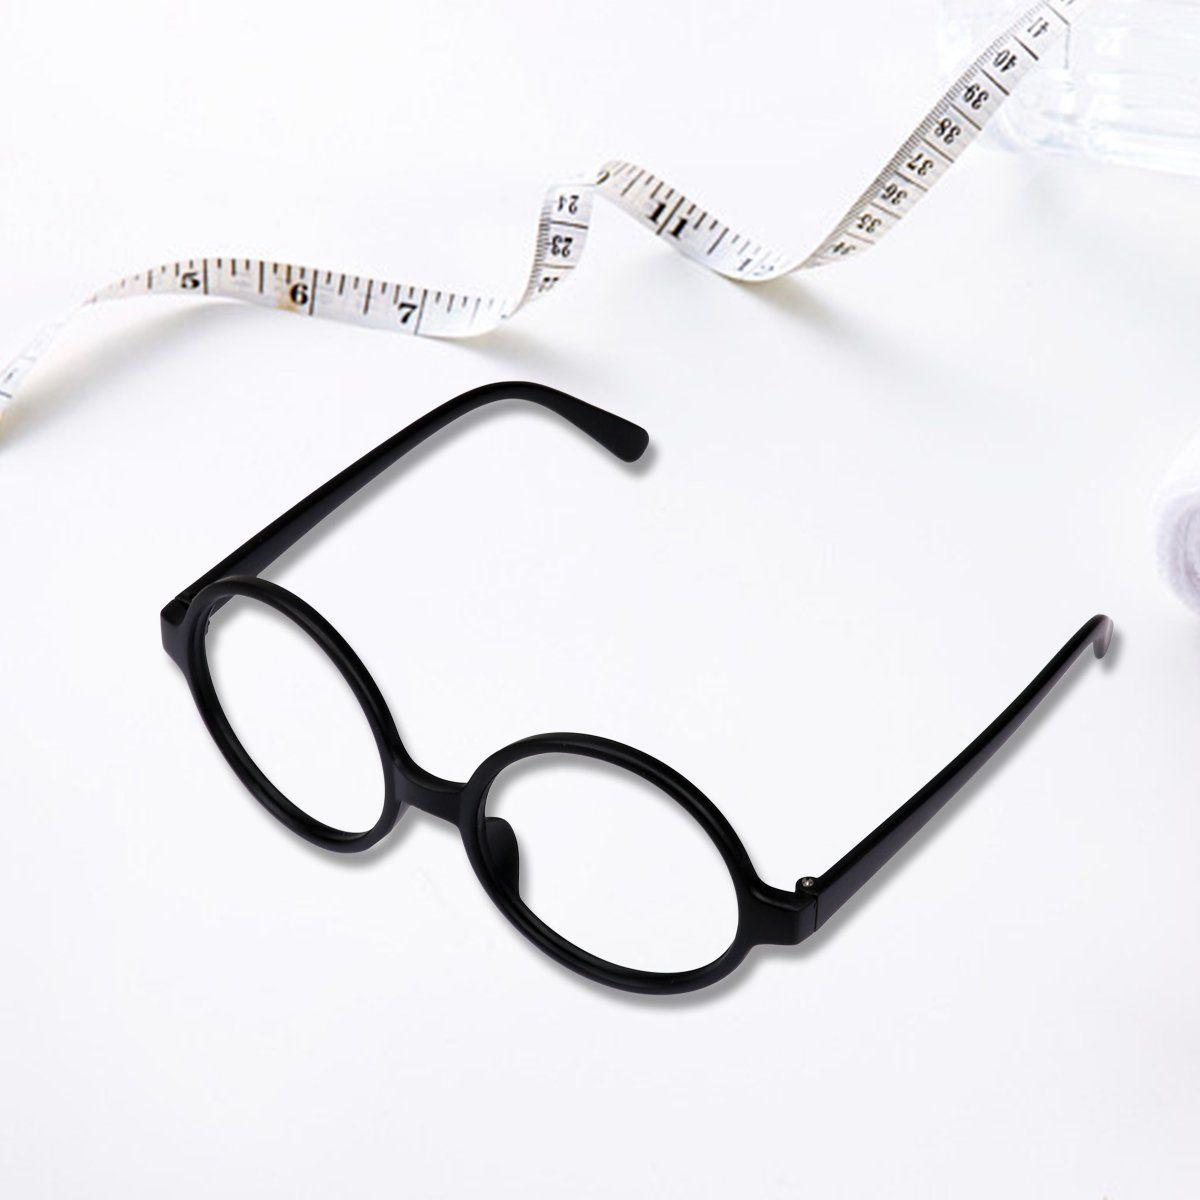 820f01d34b Kicosy 10 Pieces Glasses Frame Black Children Retro Round Glasses Frame Kids  Plastic Wizard Glasses Frame No Lenses for Boy or Girls Dress Up and  Pretend ...